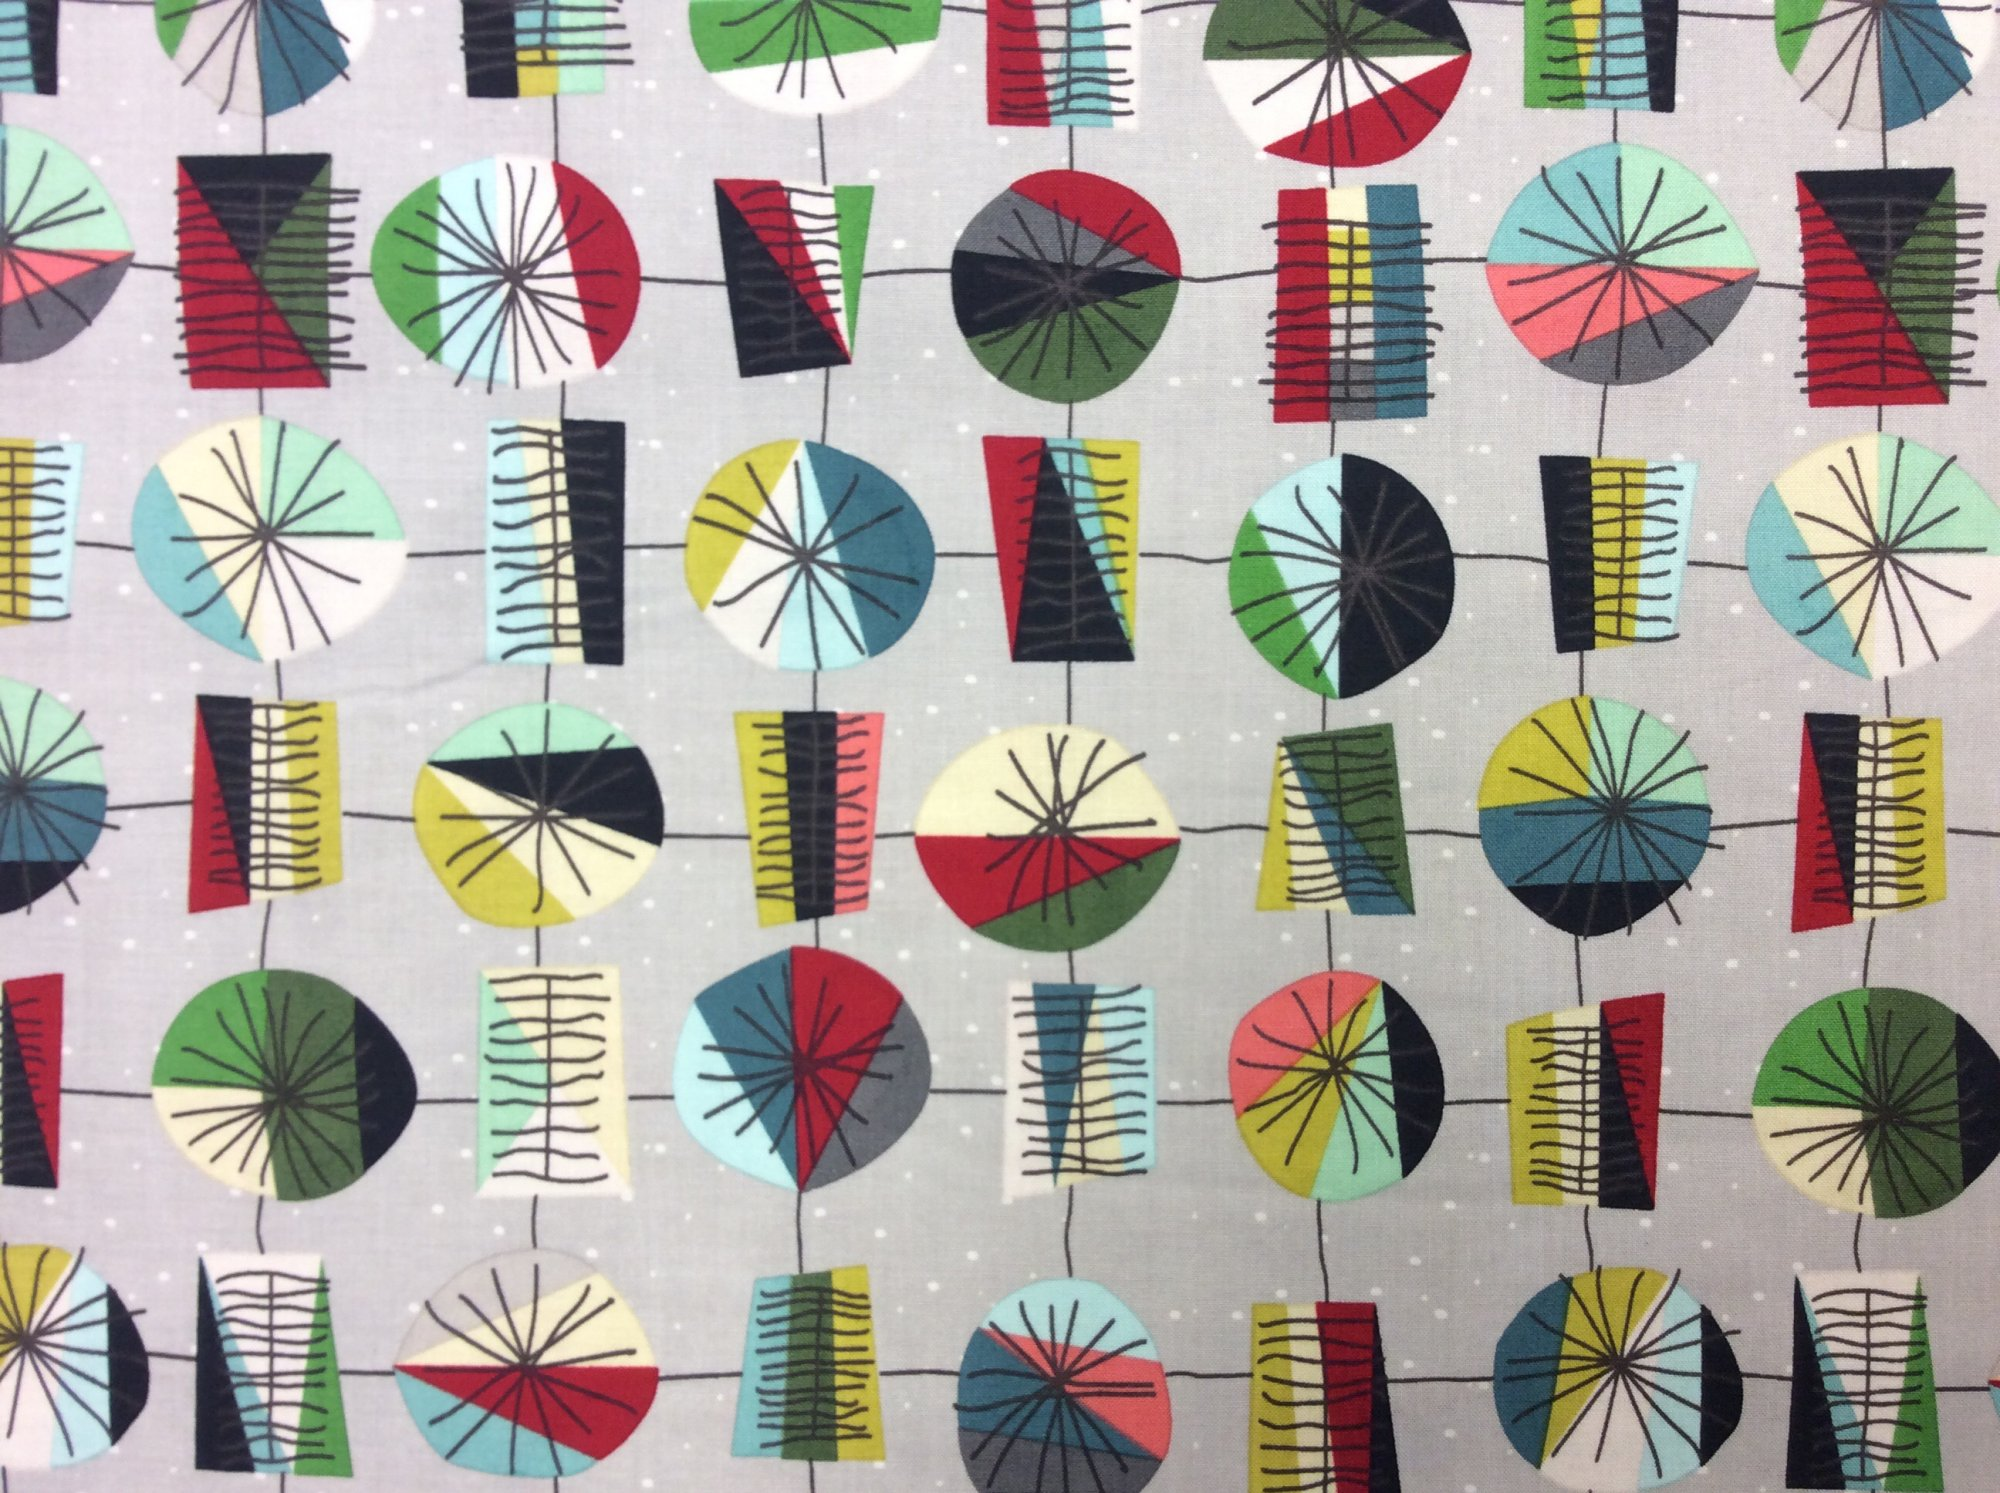 Atomic Era Retro Mod Mid Centery Modern Style Cotton Quilt Fabric MD327